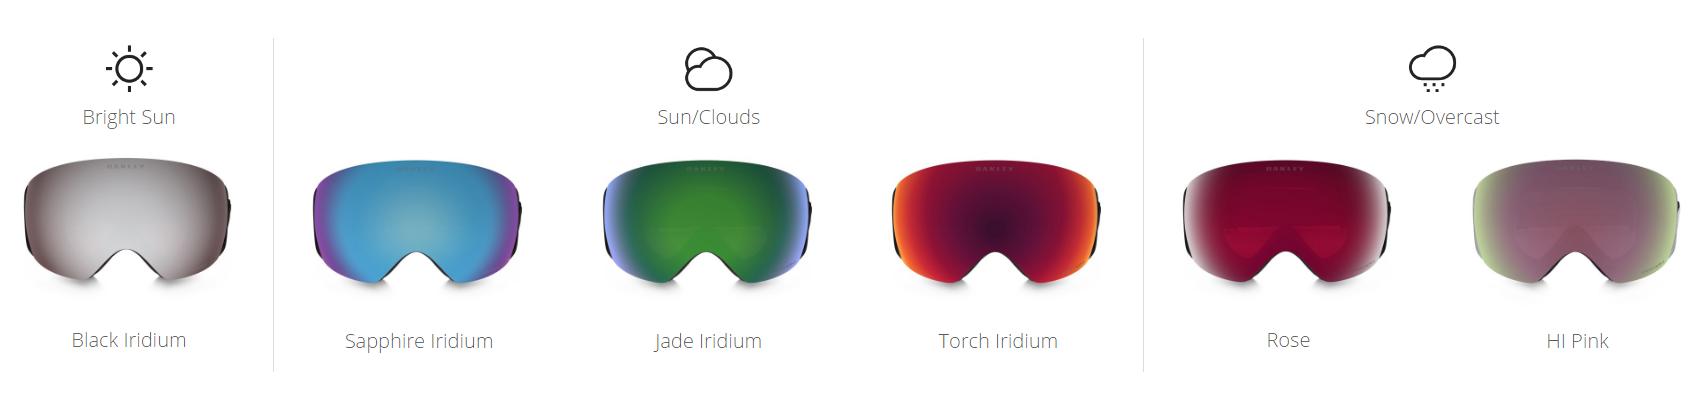 PRIZM Snow Lenses